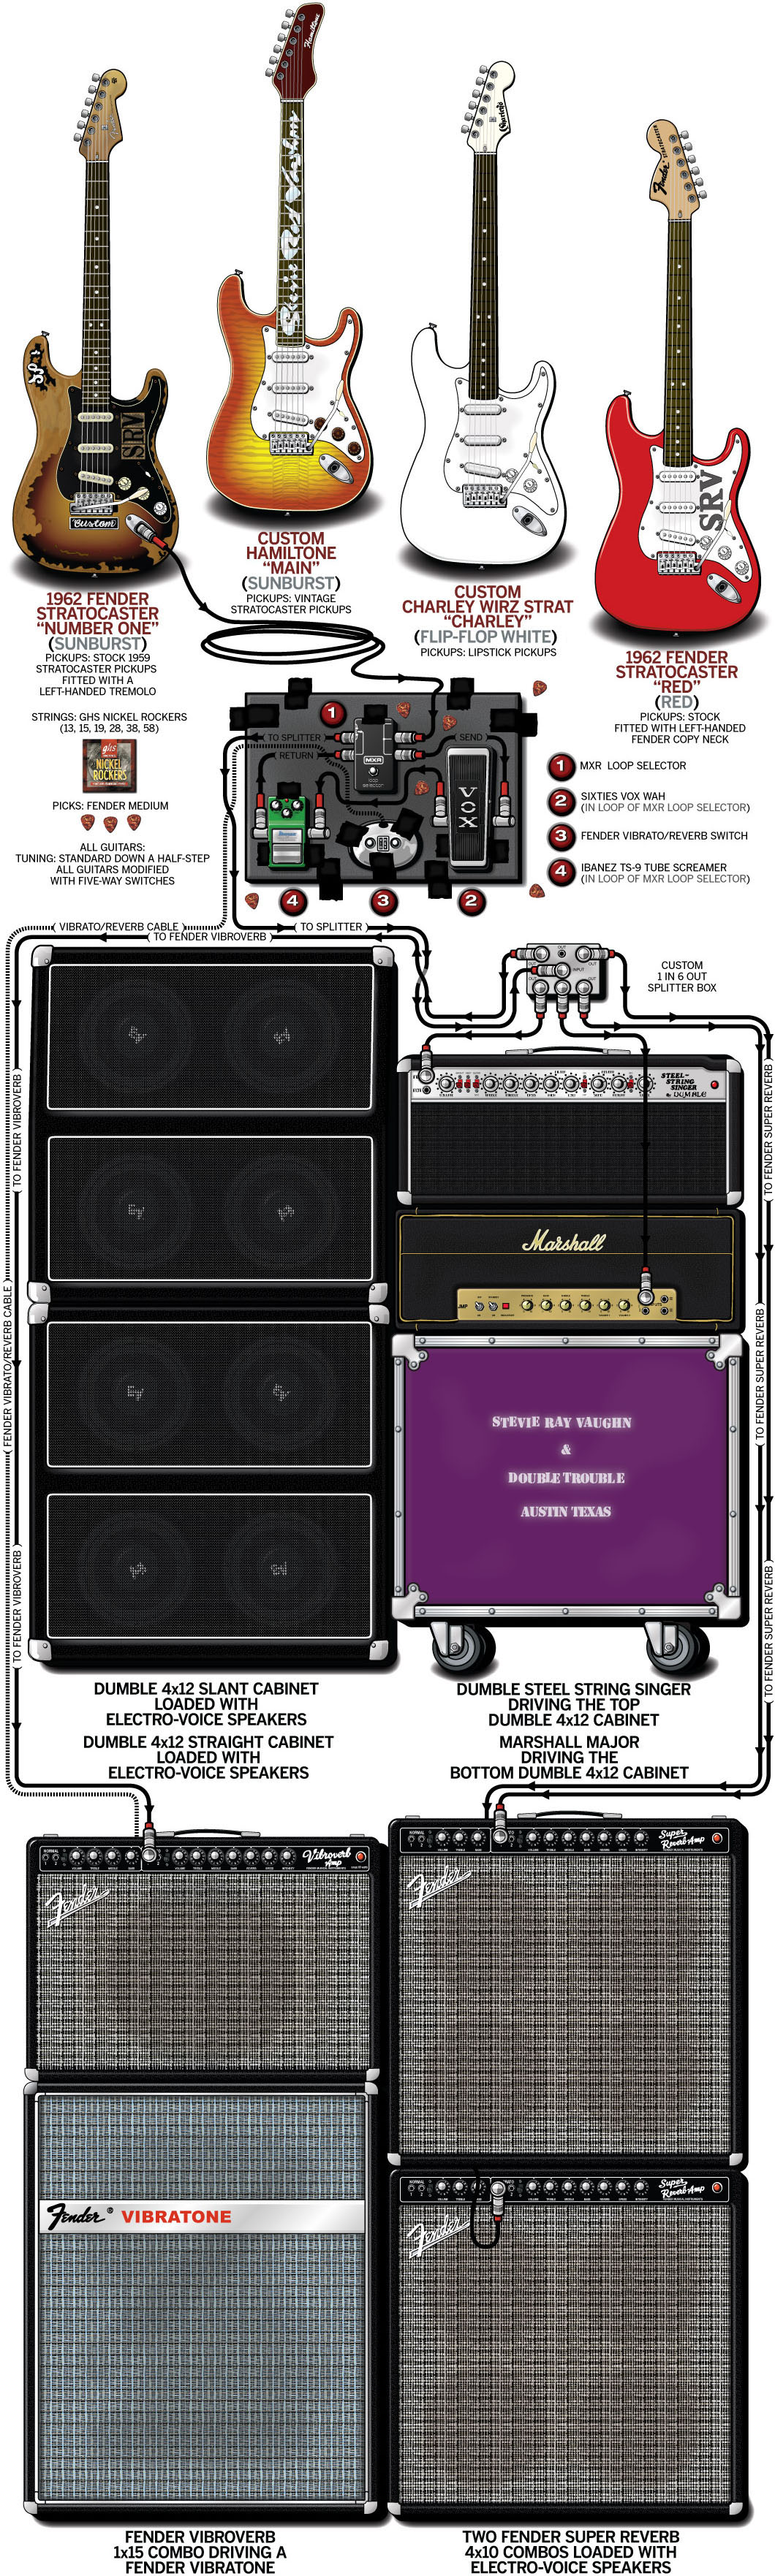 Stevie Ray Vaughan Guitar Gear & Rig – 1985